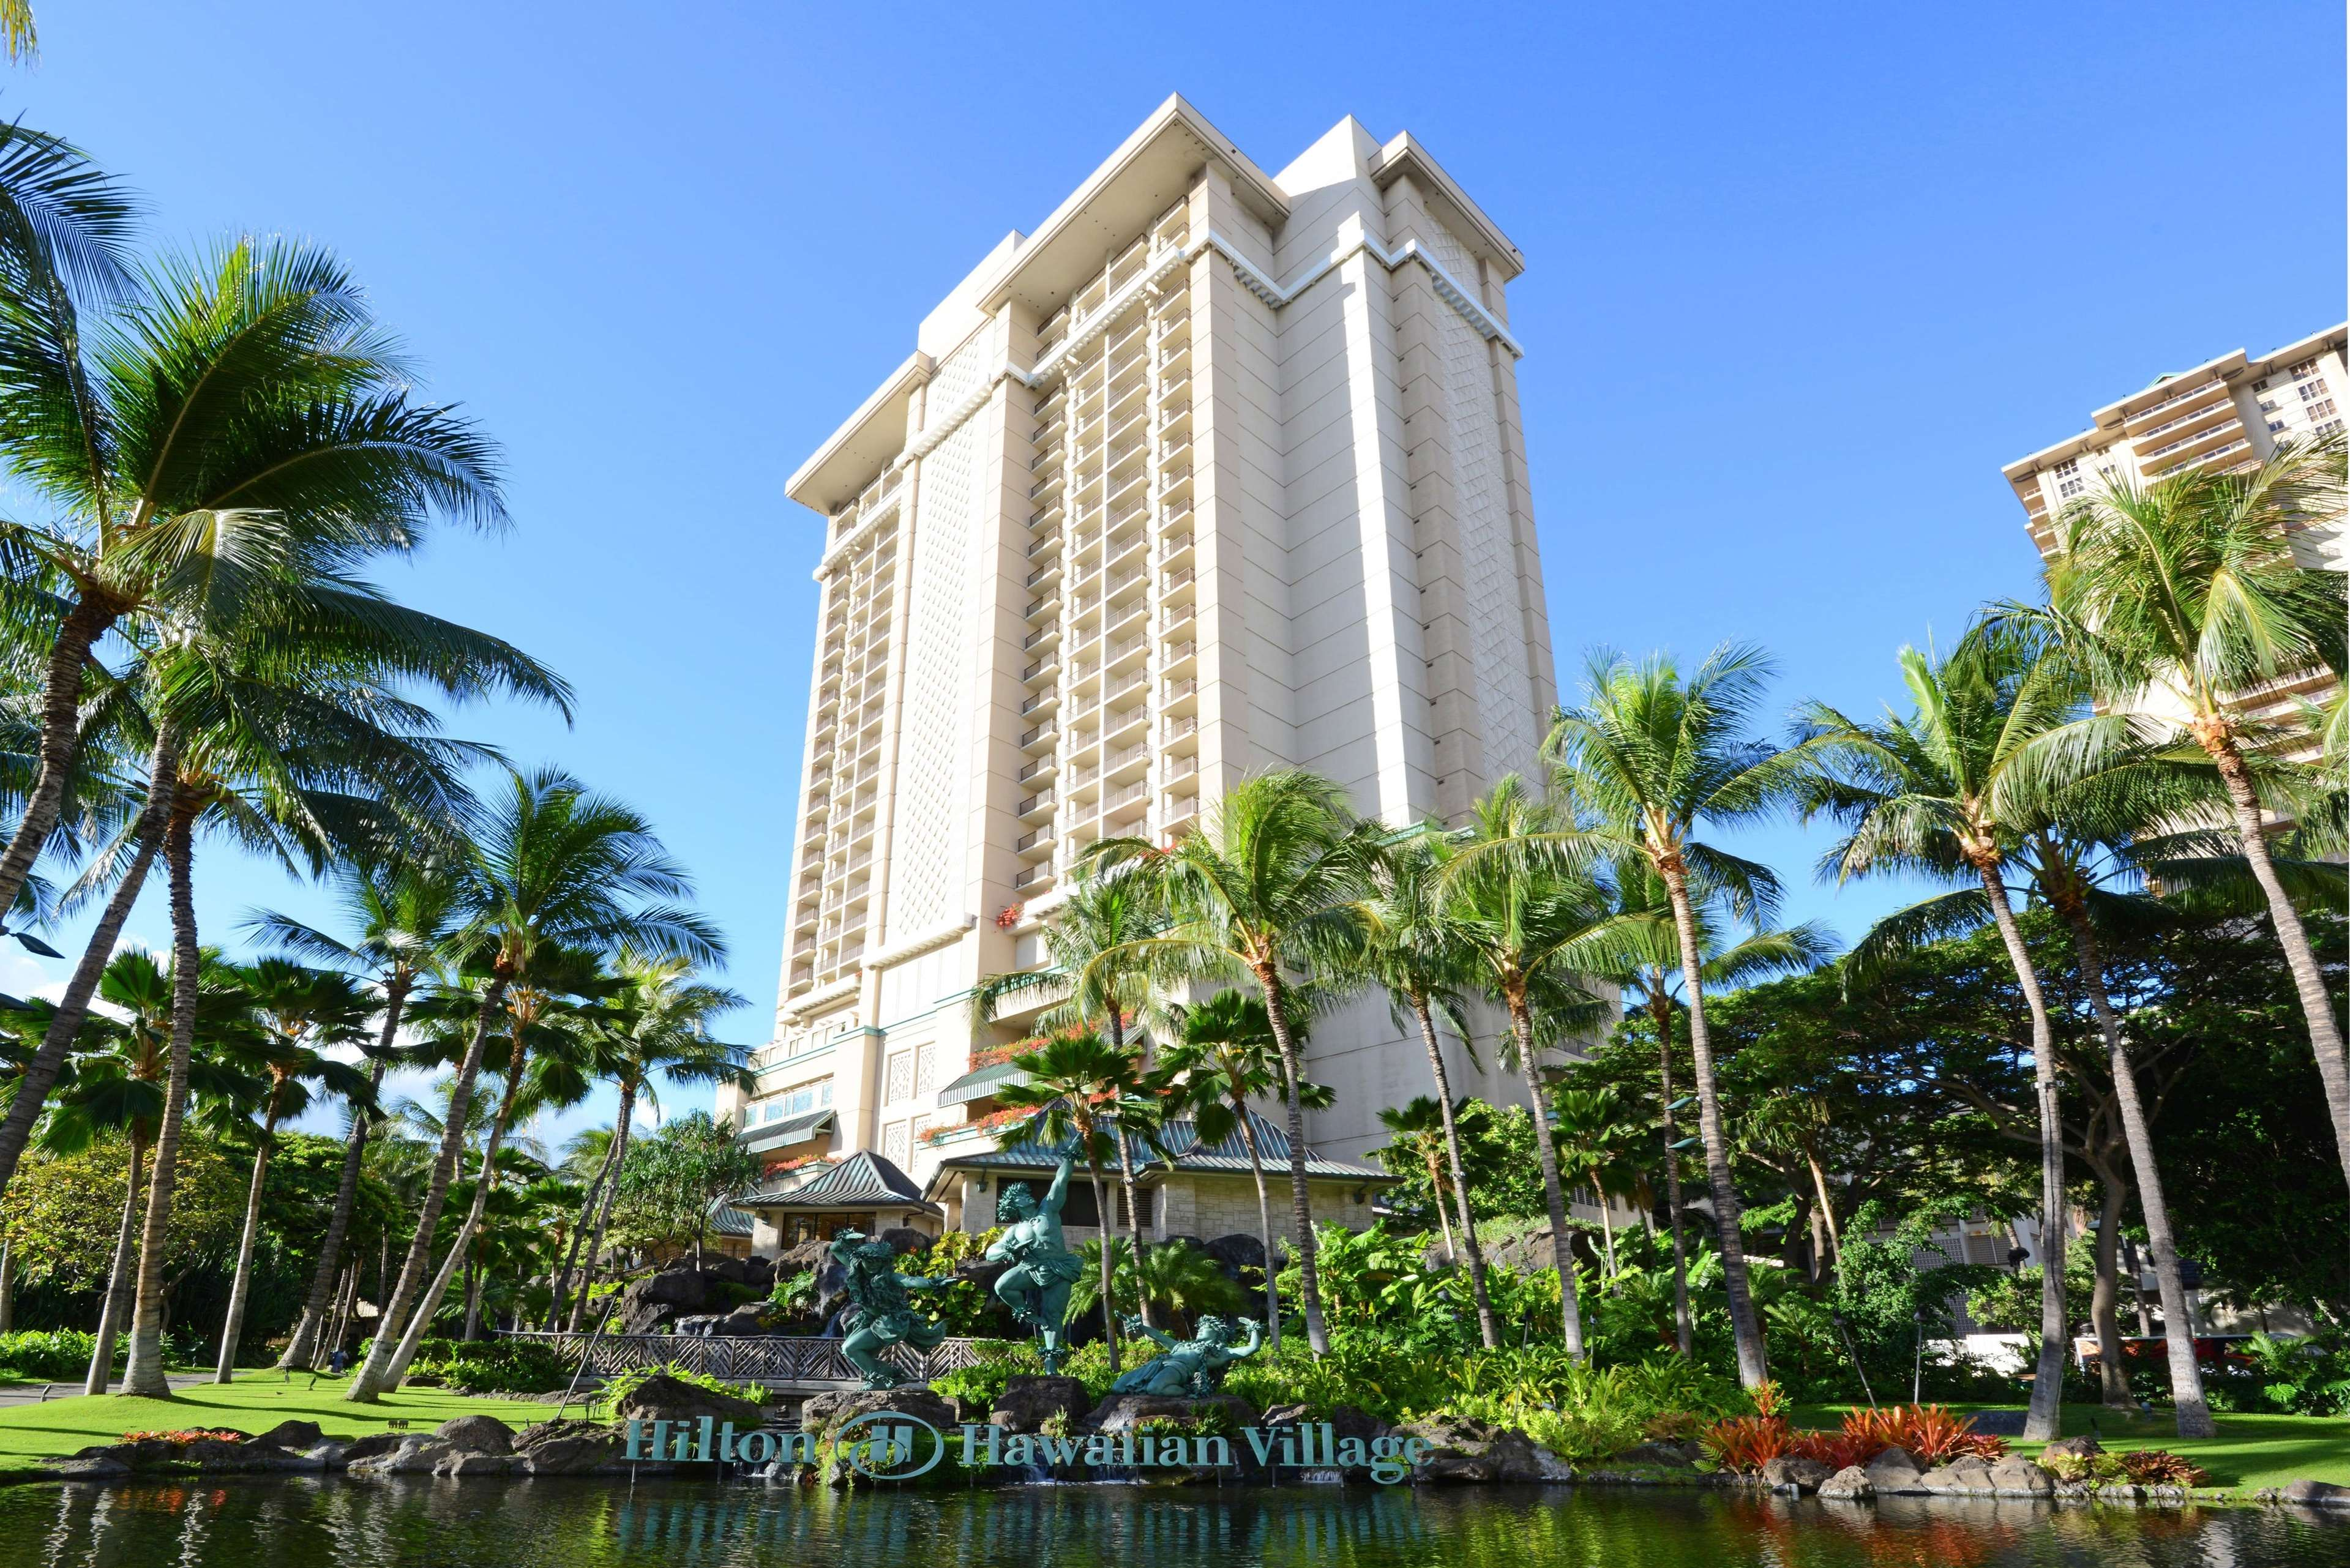 Hotels Near Hilton Hawaiian Village